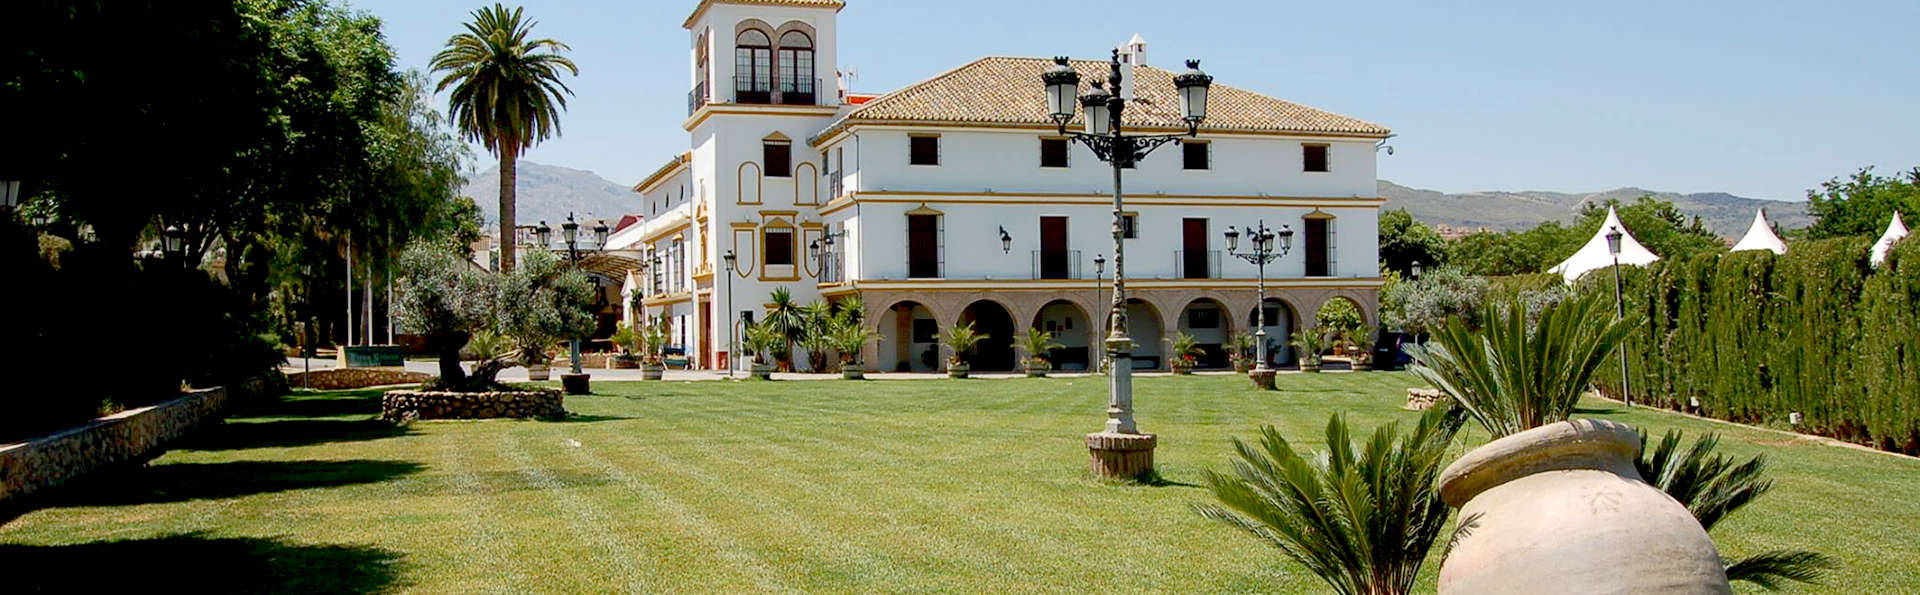 Hotel Finca Eslava Spa - Edit_Front.jpg